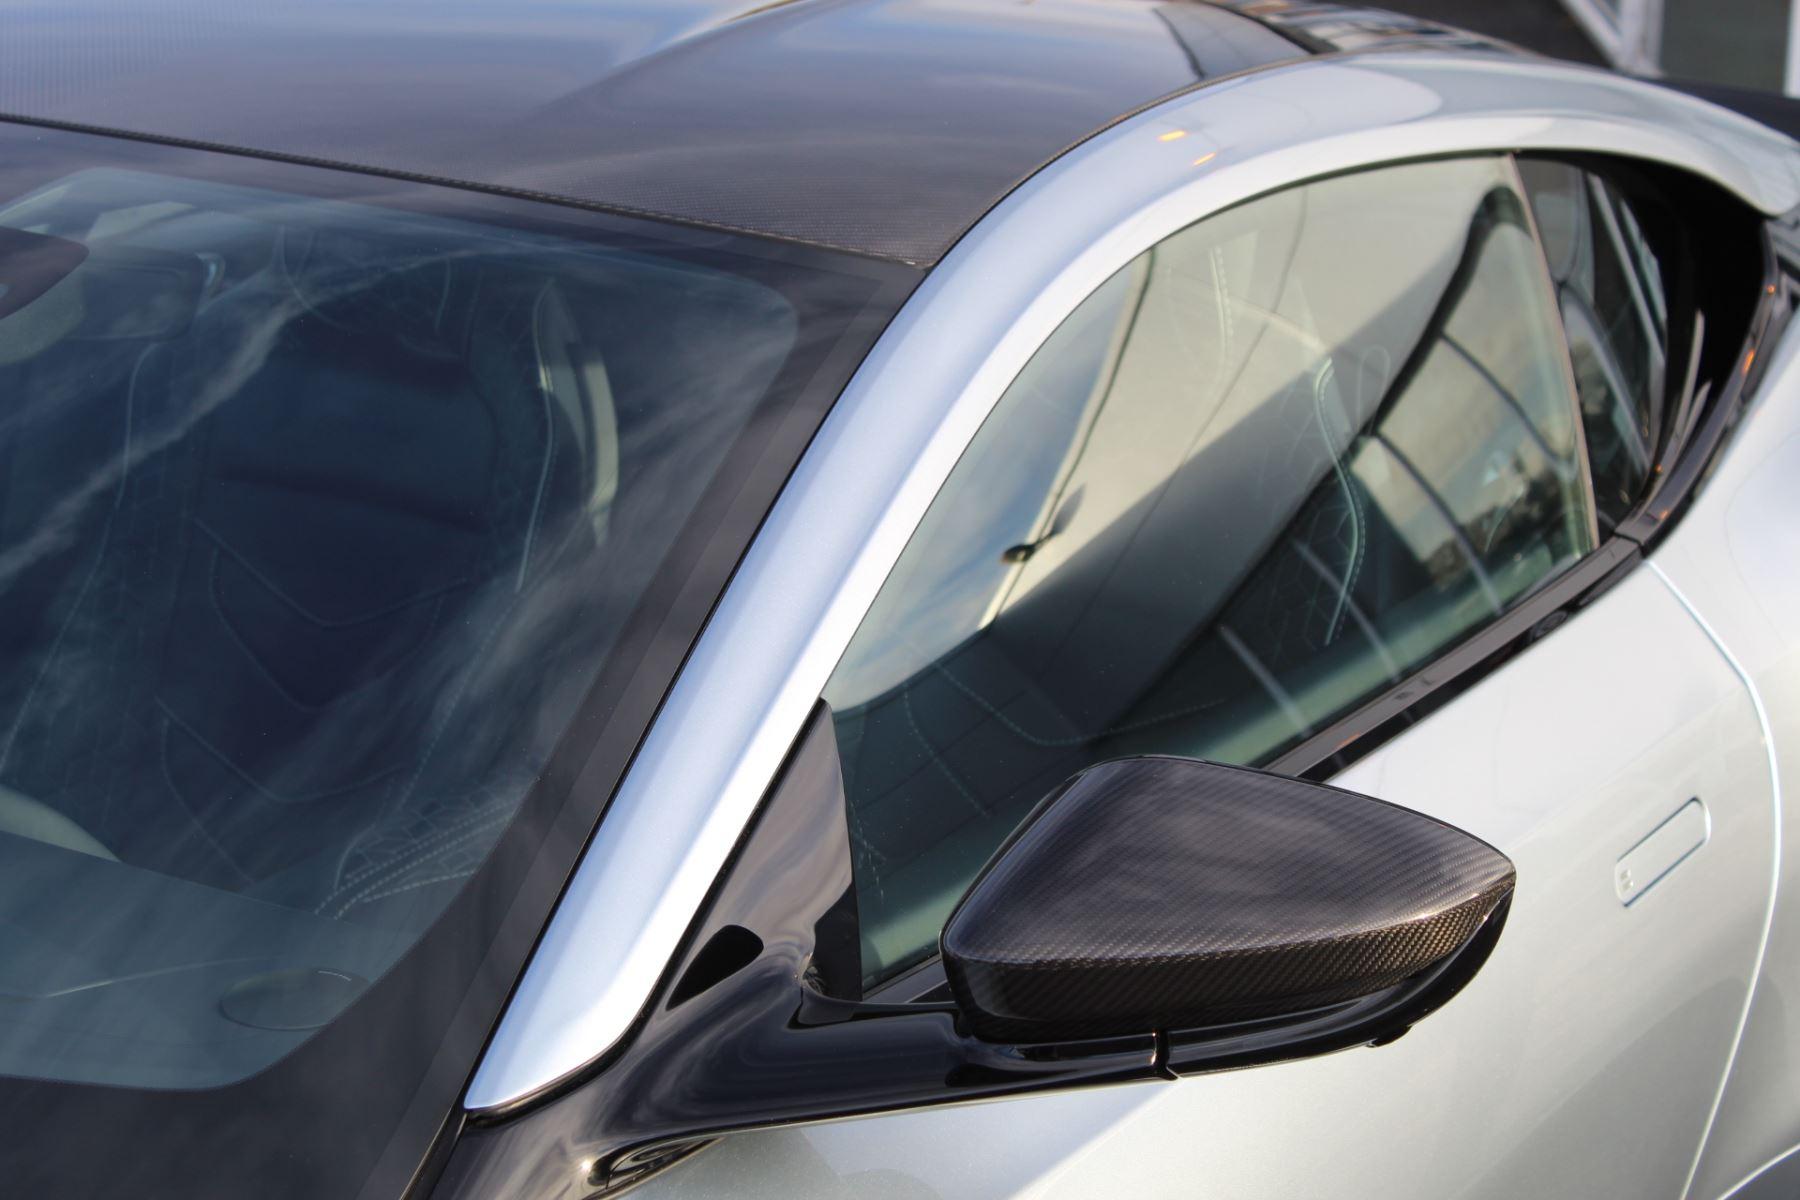 Aston Martin DBS Superleggera V12 2dr Touchtronic image 23